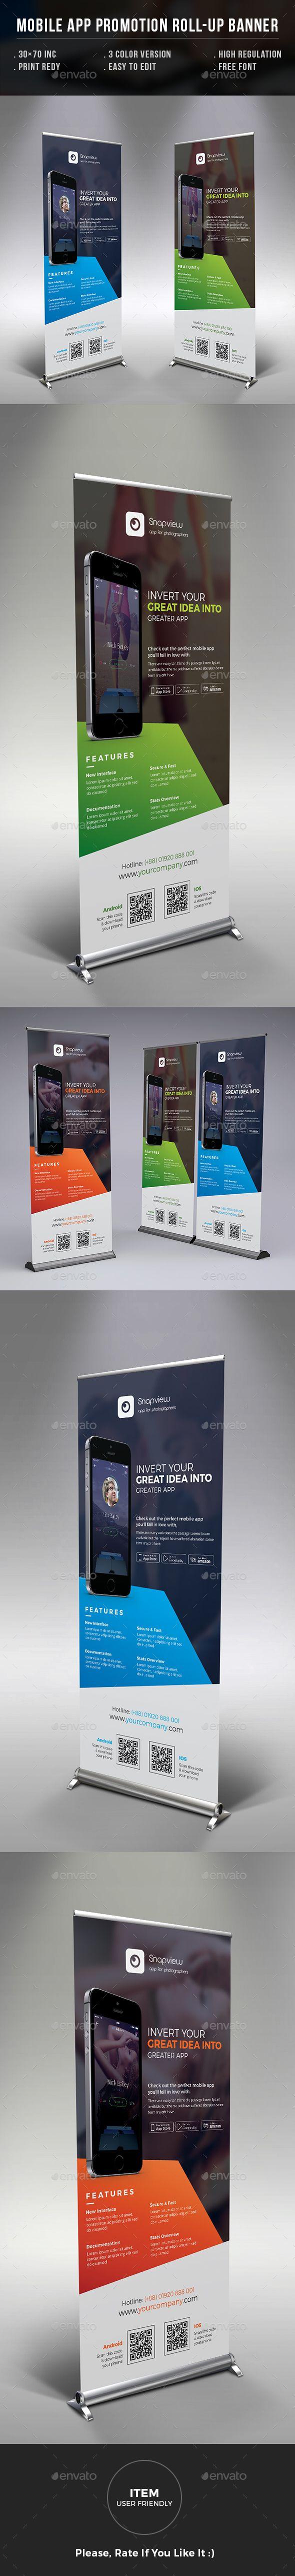 Mobile App Promotion Roll-up Banner - Signage Print Templates Download https://graphicriver.net/item/mobile-app-promotion-rollup-banner/17547170?ref=themedevisers